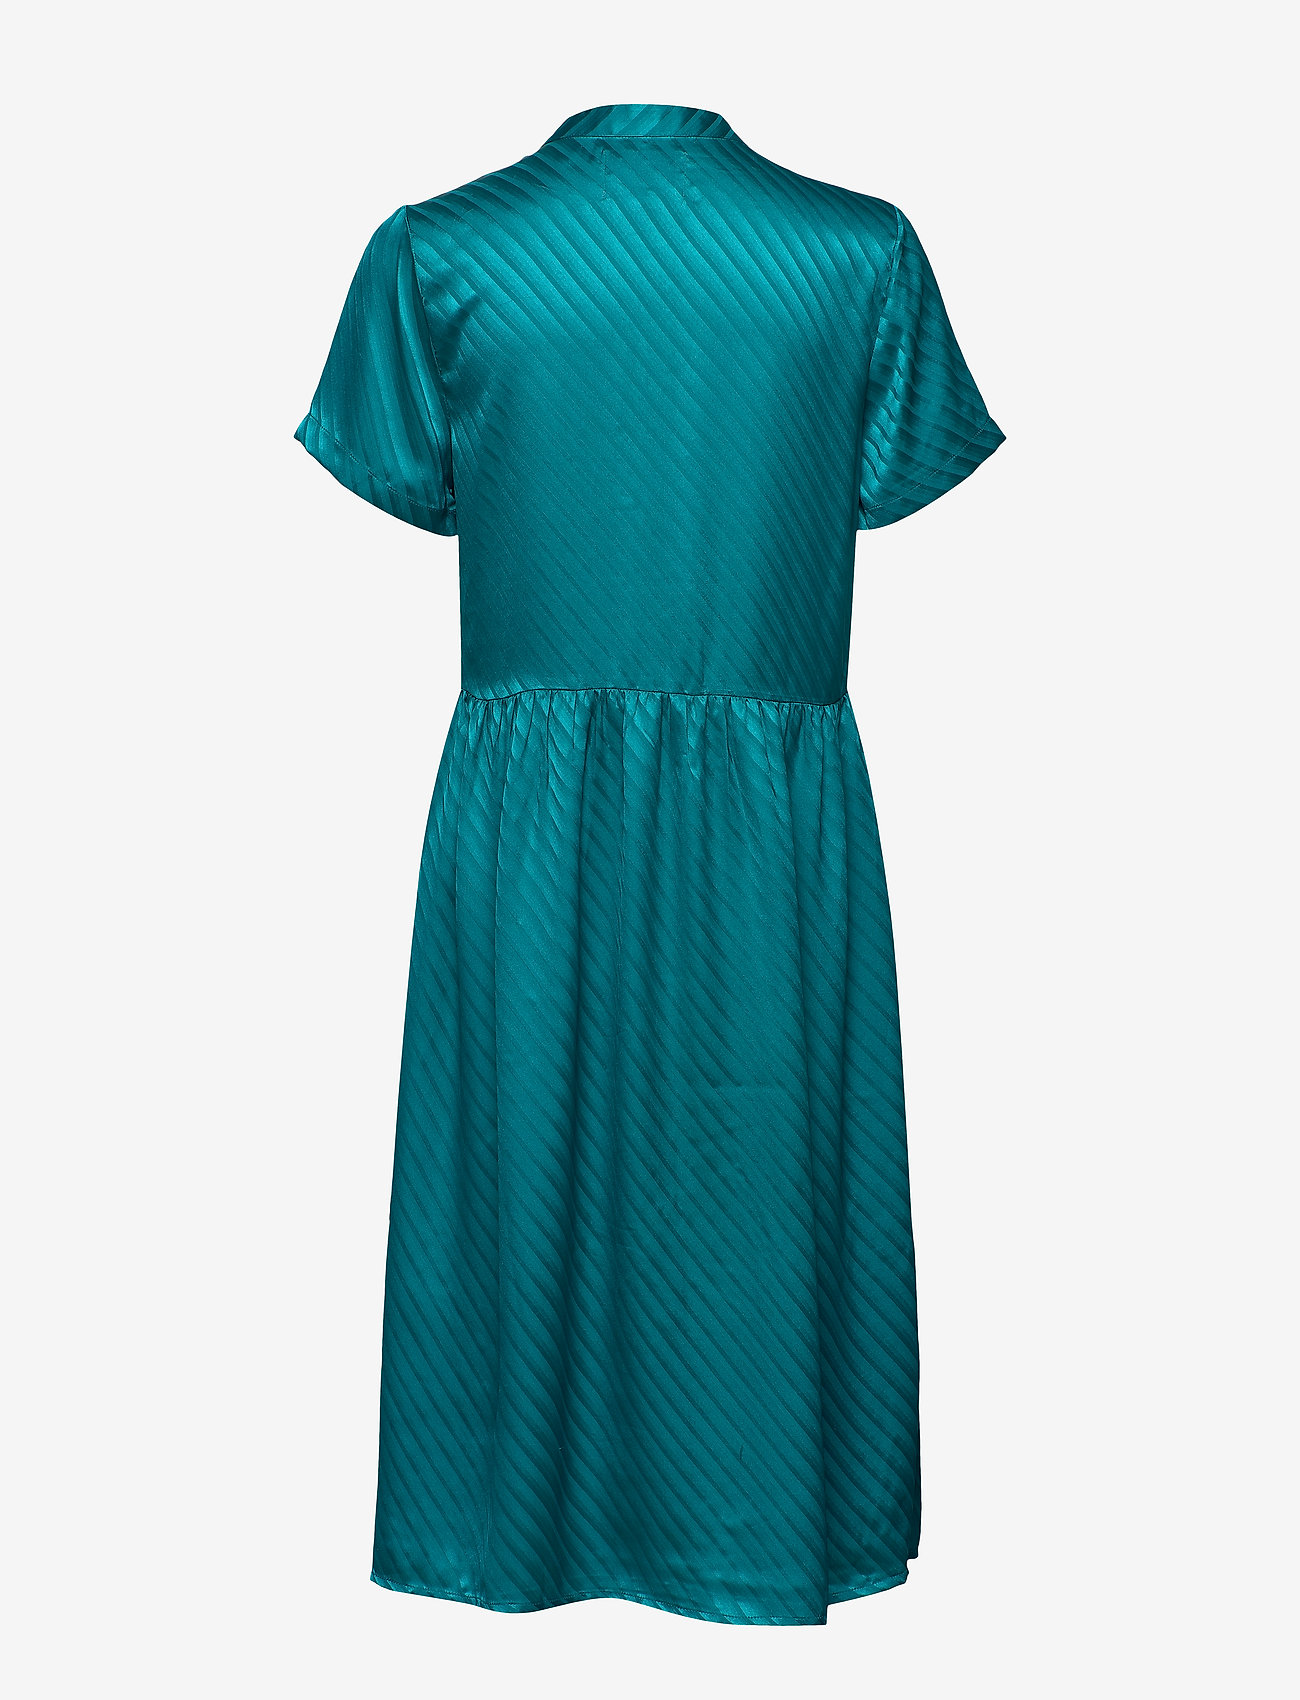 Lollys Laundry Aliya Dress - Dresses